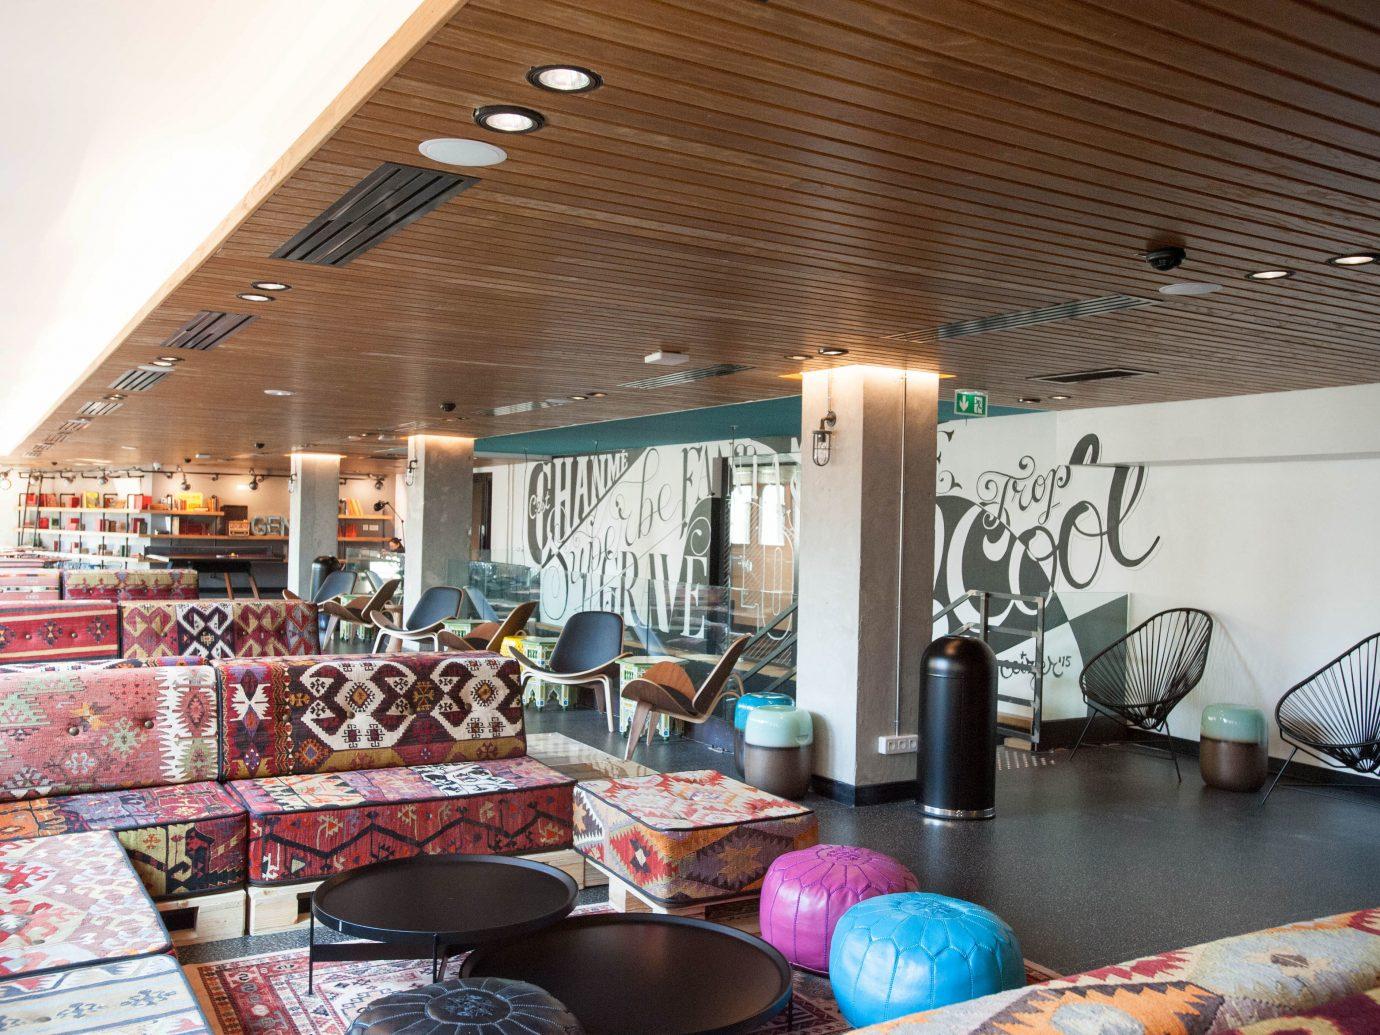 Budget Hotels Lounge indoor ceiling room restaurant interior design real estate meal Lobby Design area furniture